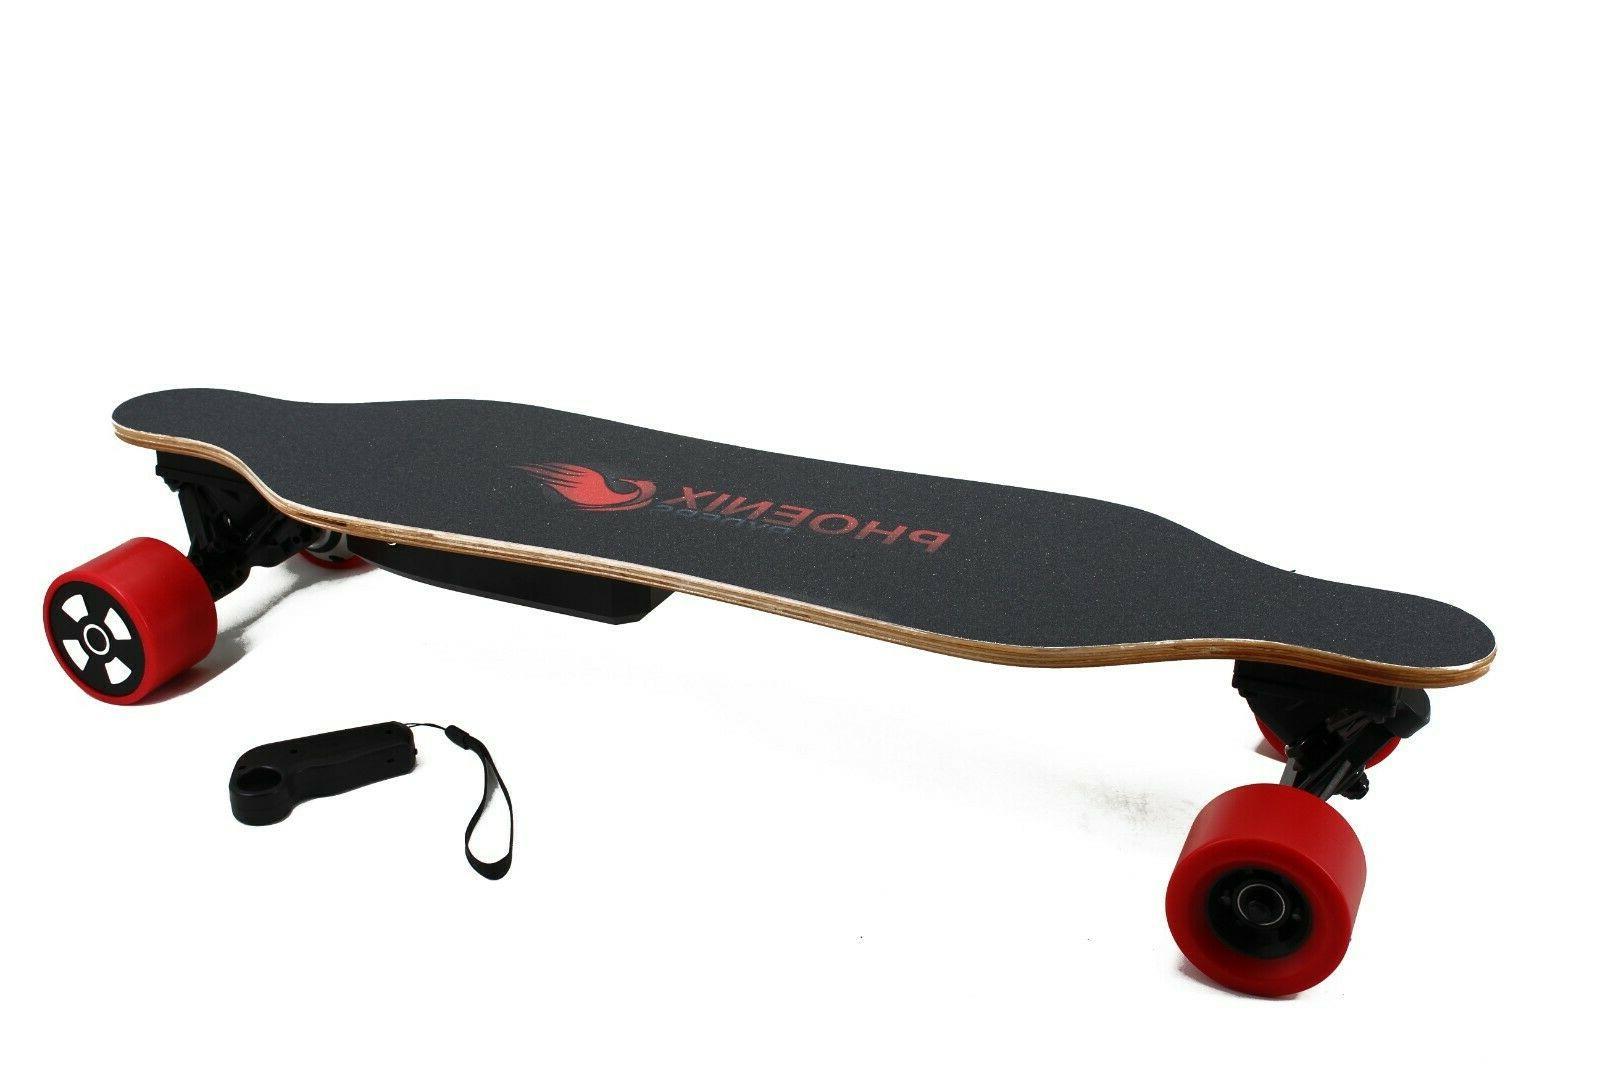 Phoenix 9.3Miles Control Longboard